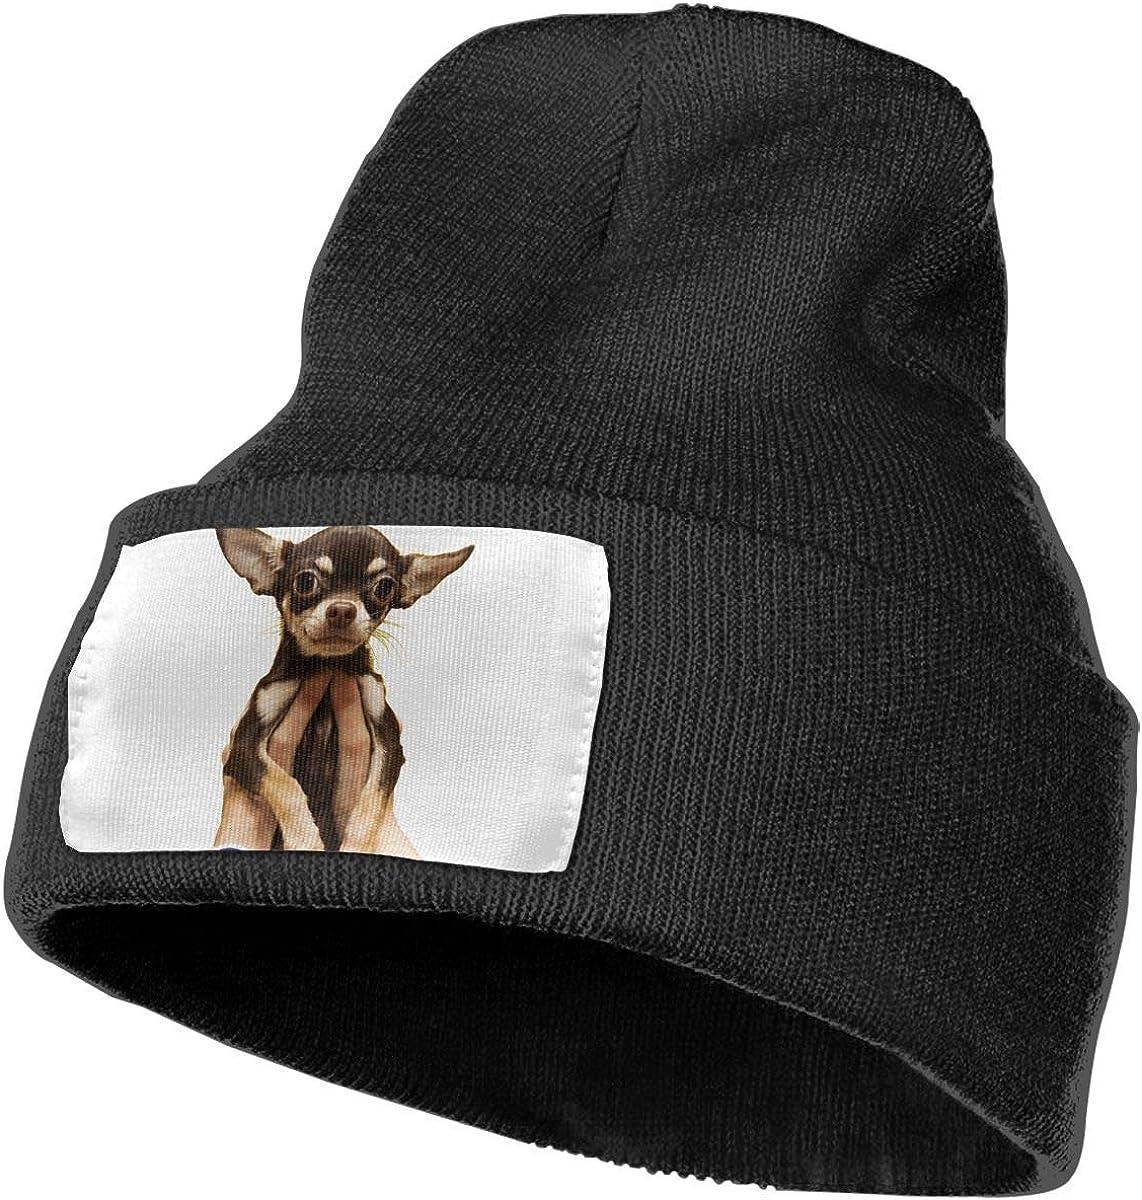 QZqDQ Pride Great Dog Lover Unisex Fashion Knitted Hat Luxury Hip-Hop Cap